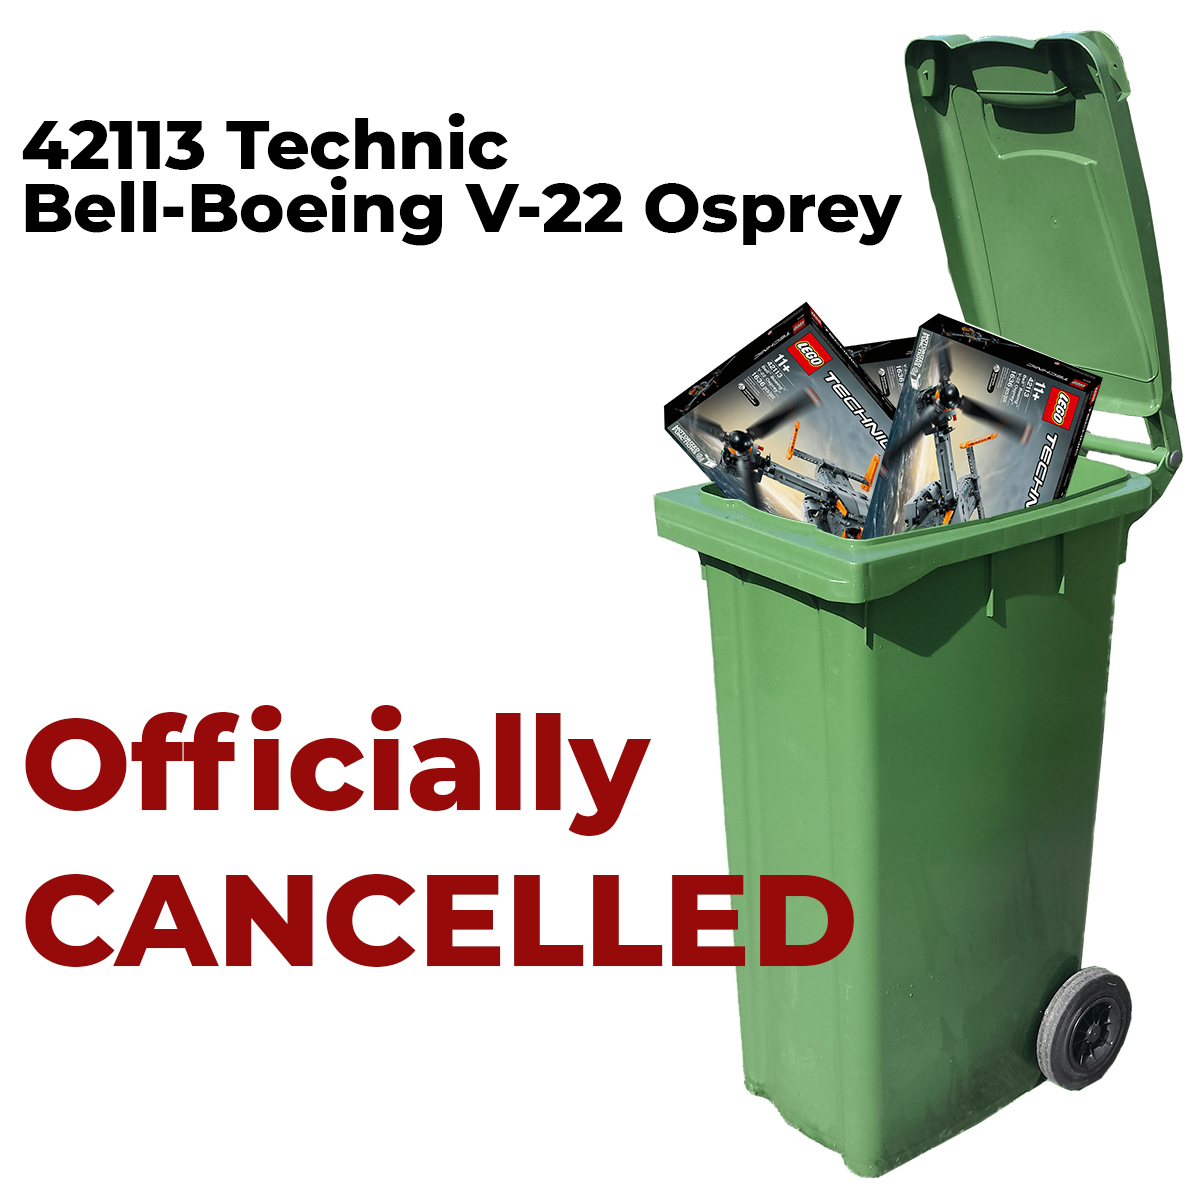 technic-osprey-cancelled